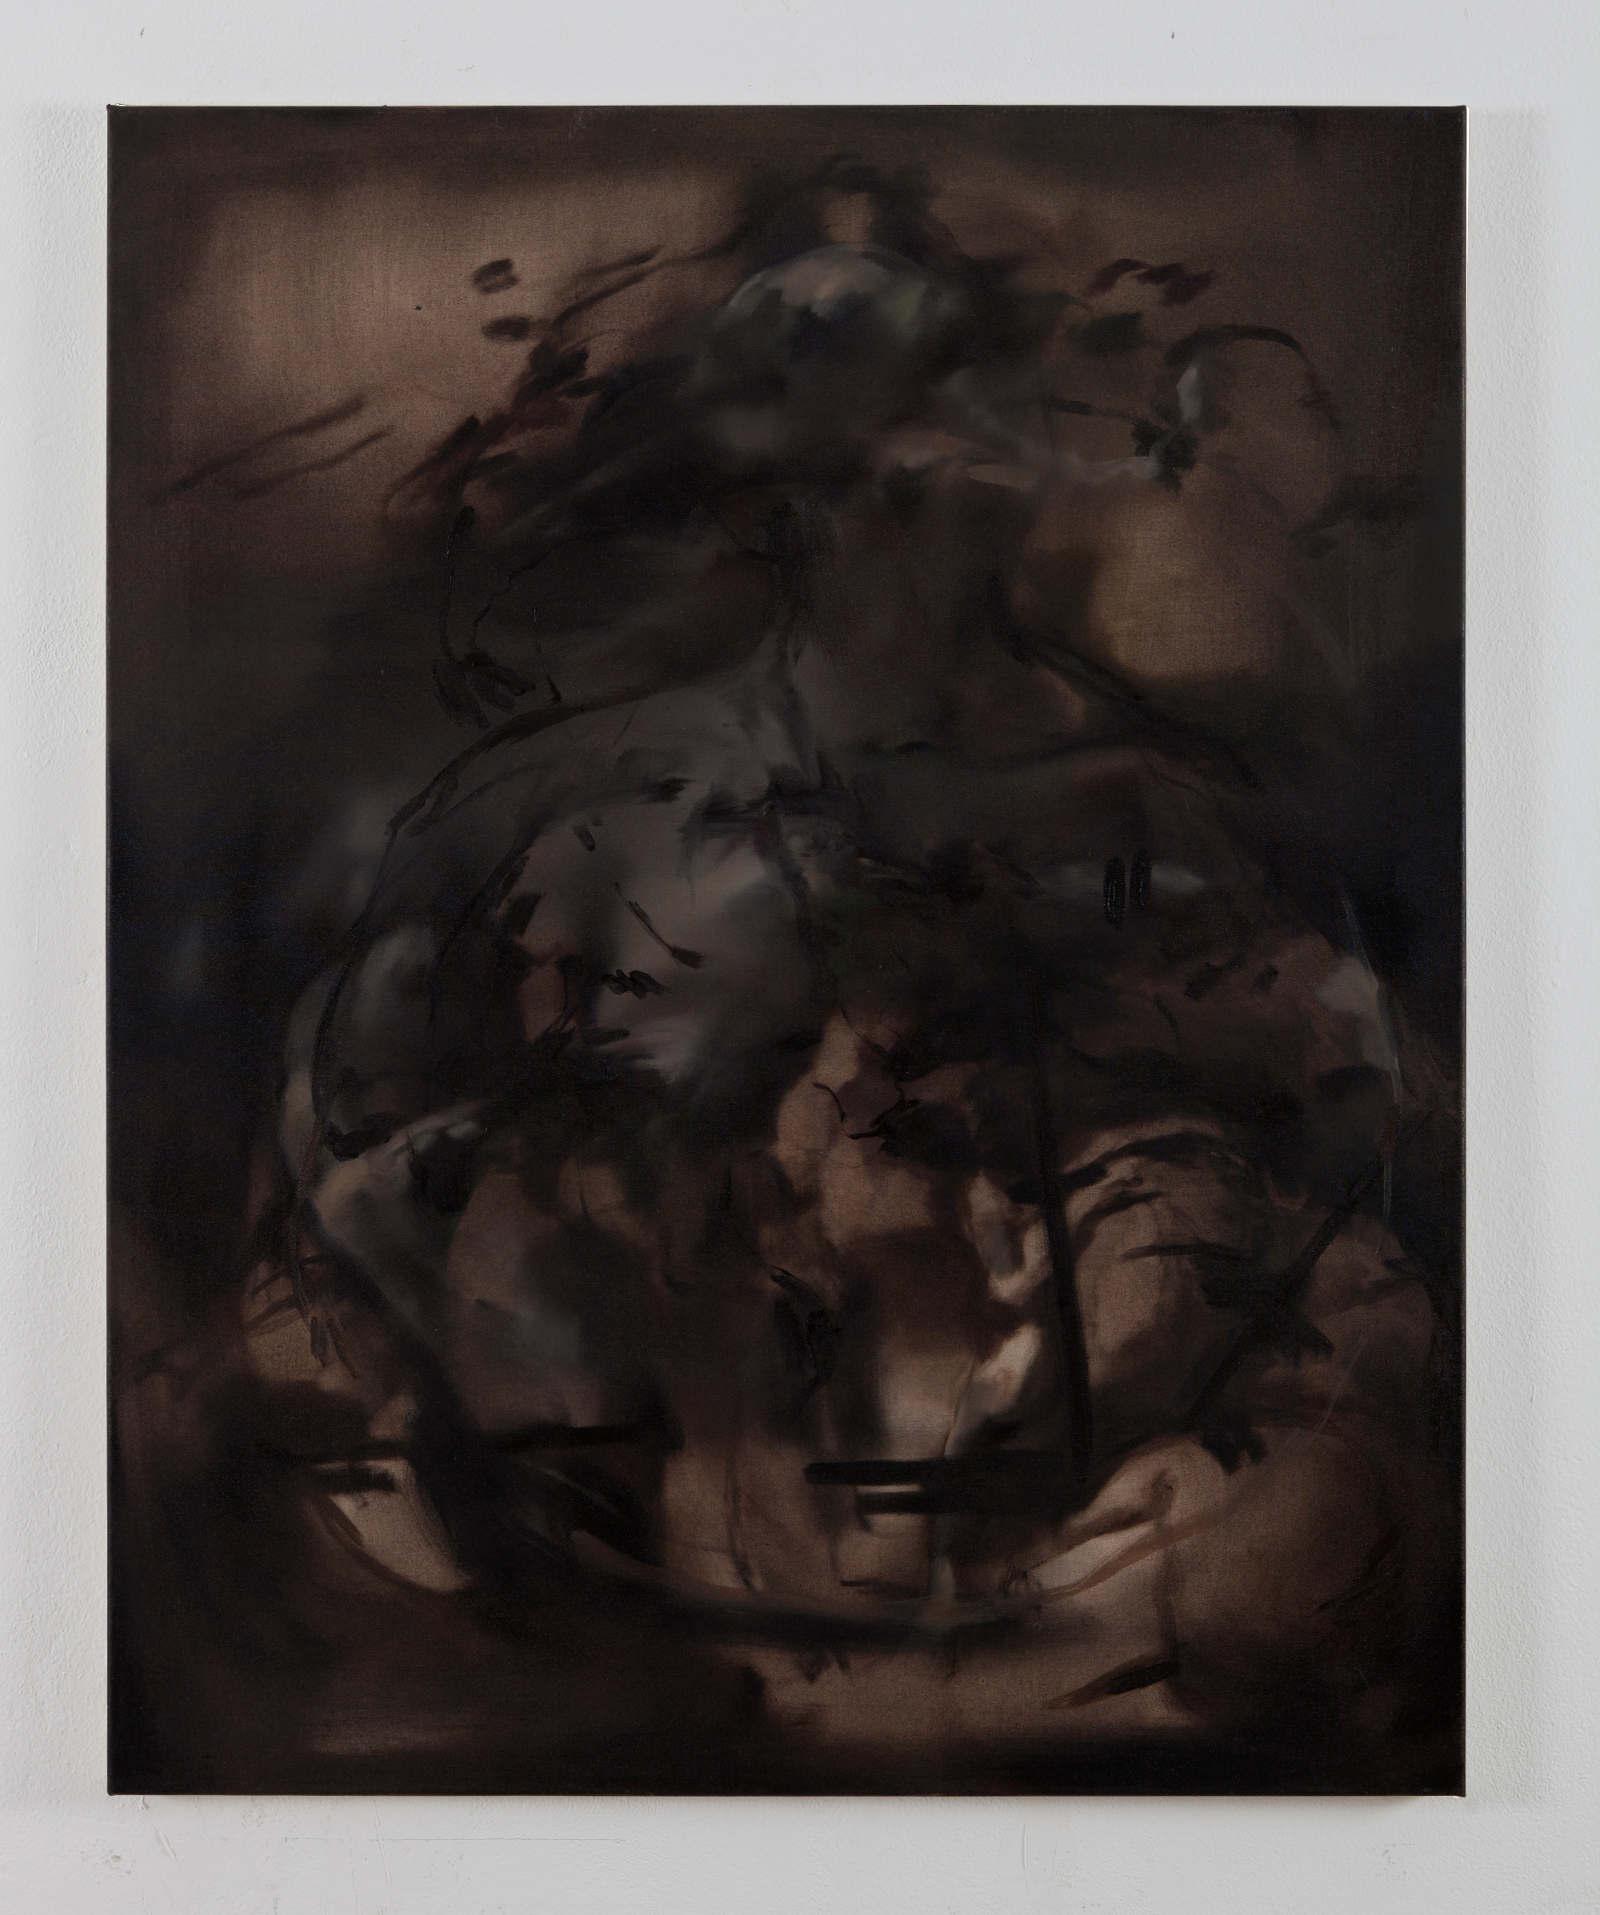 5. Nazzarena Poli Maramotti, Muta, 2014, olio su tela 100x80cm